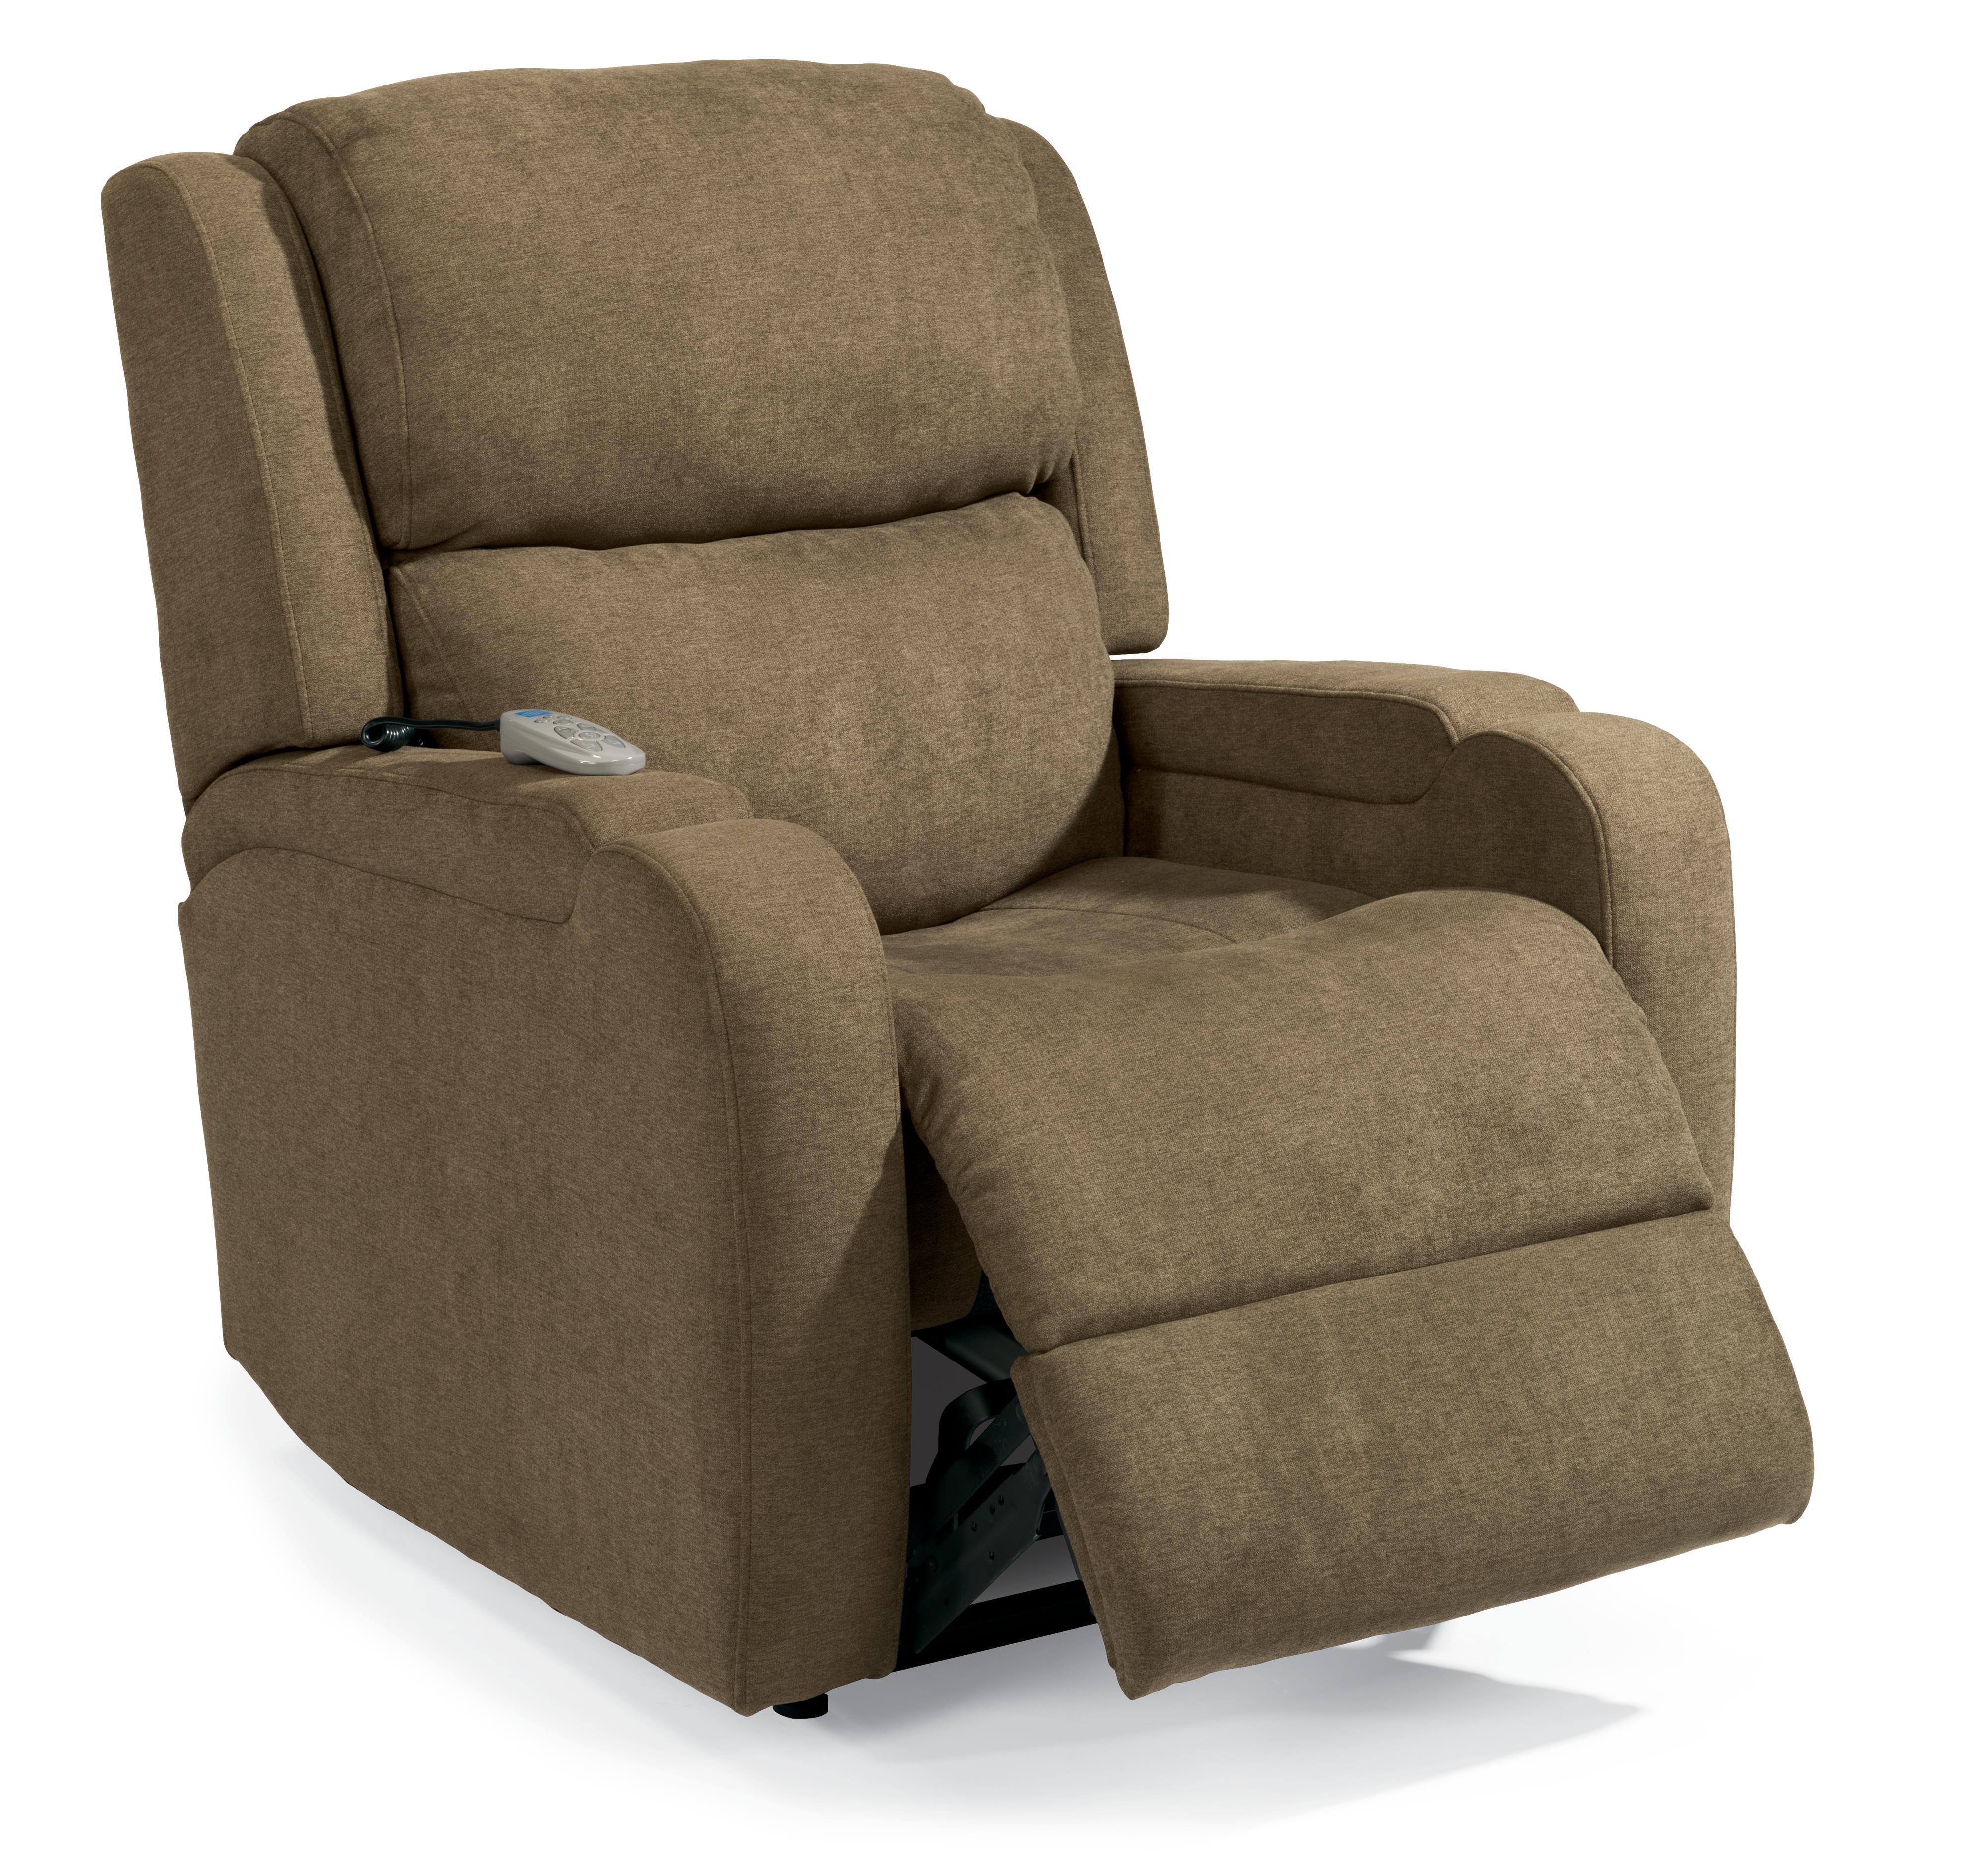 Flexsteel Latitudes Lift Chairs Melody InfinitePosition Lift